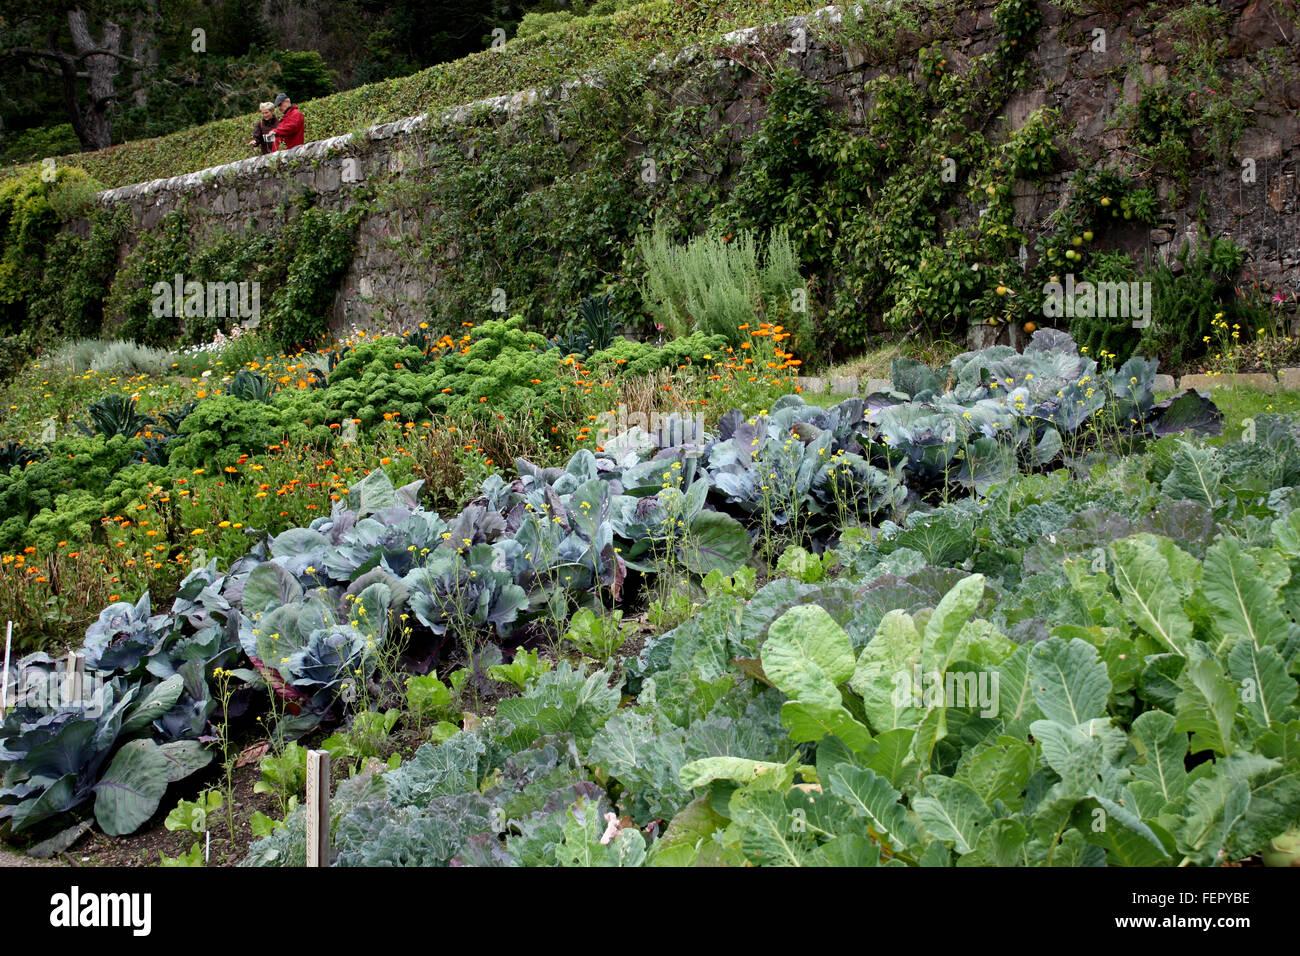 The Vegetable Garden At Inverewe Gardens, Wester Ross, Scotland